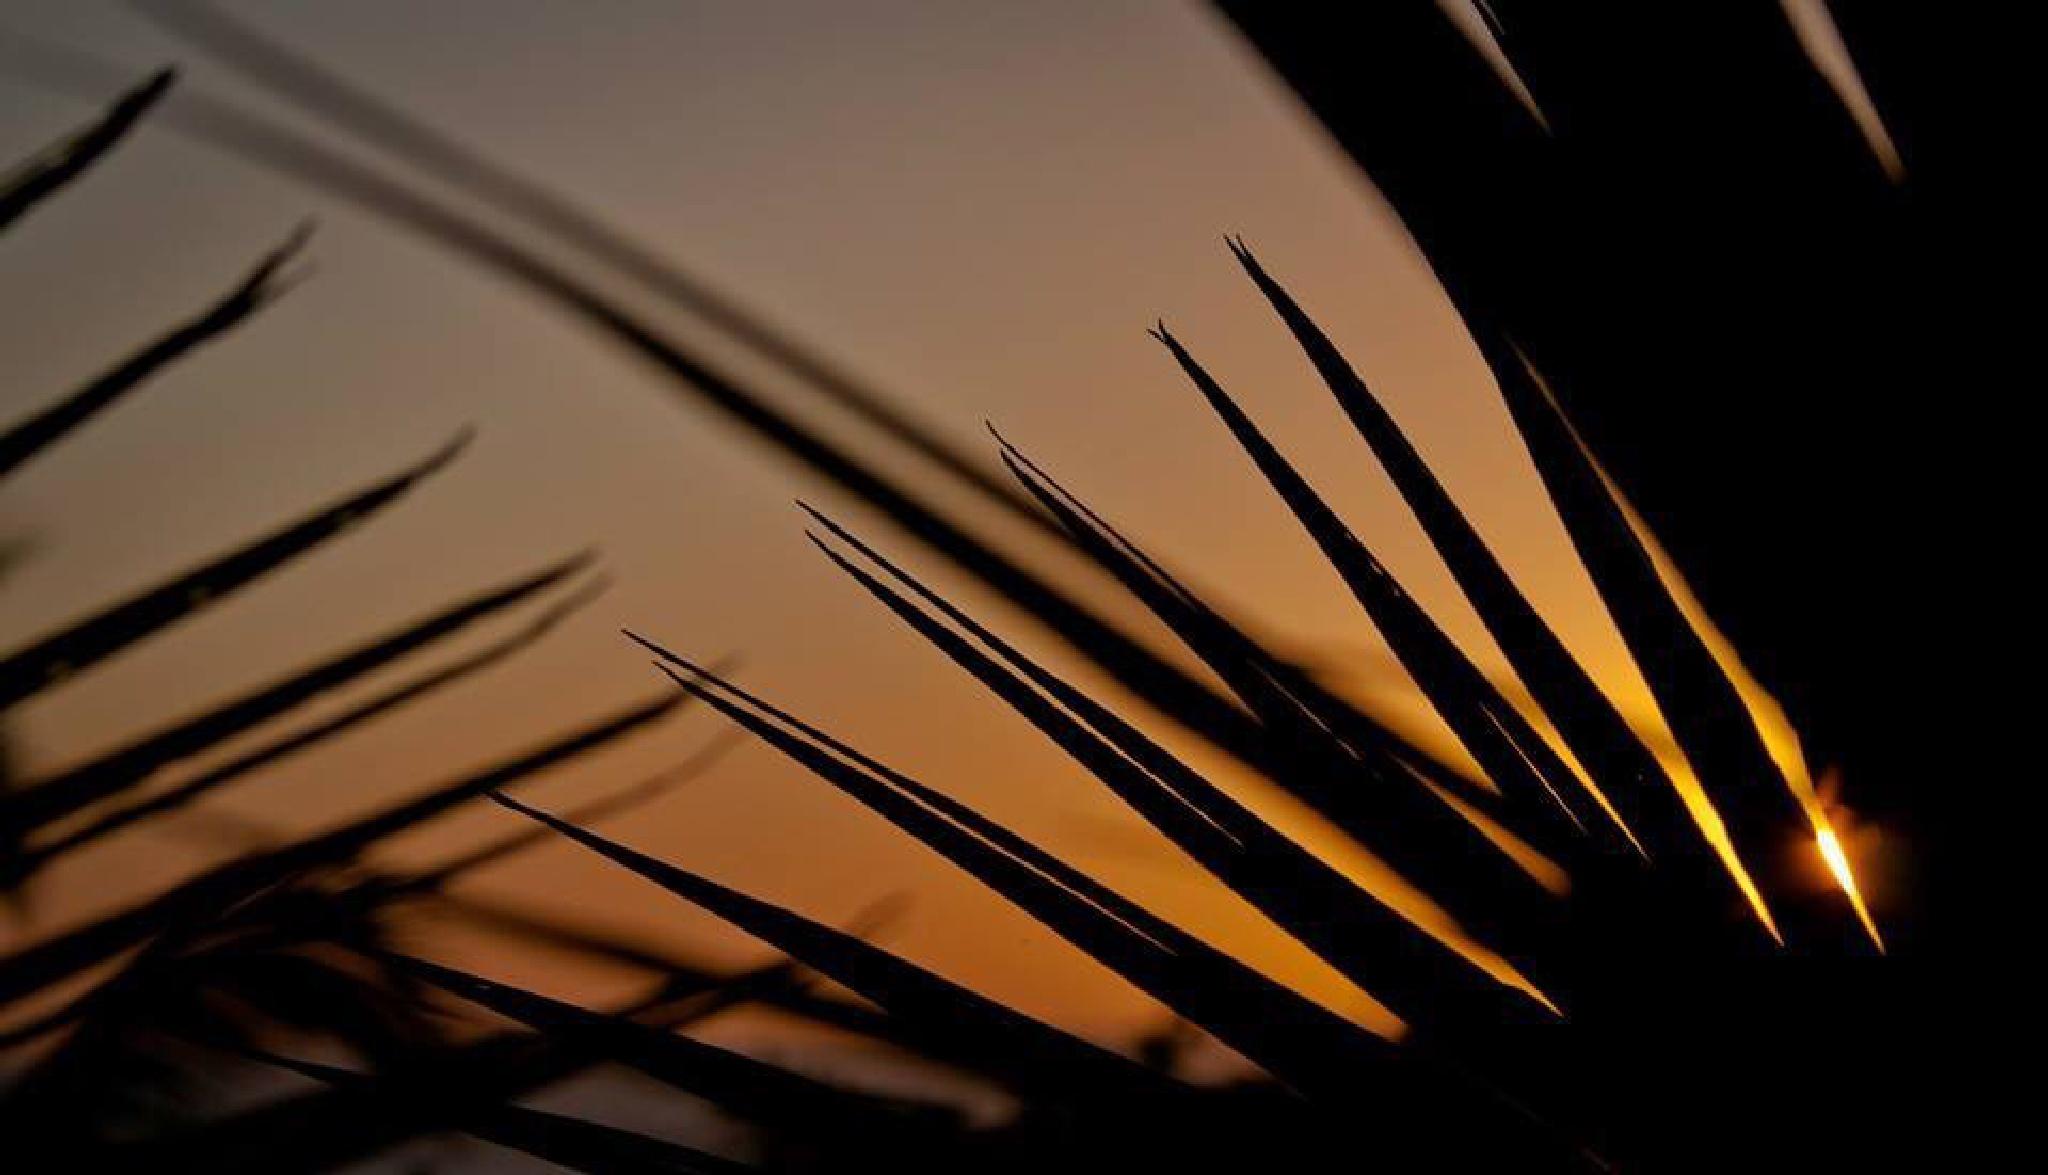 Sunset  by Irene Picaud